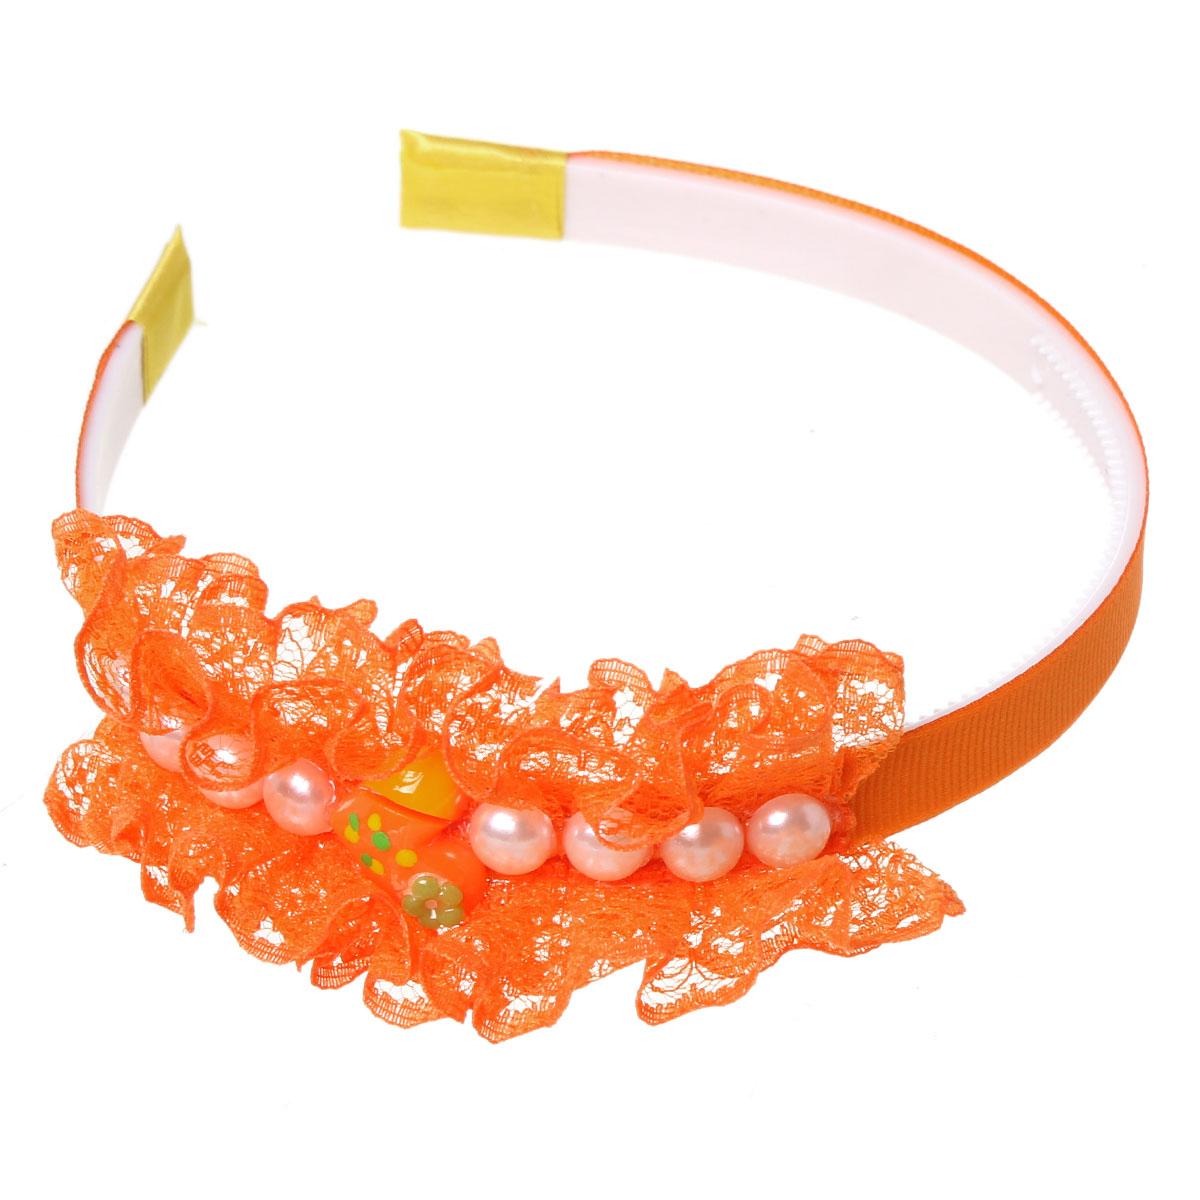 "Acrylic Headband Heart Orange Flower With White Pearl Imitation 37.2cm(14 5/8"")x 12mm(4/8""),3 PCs 2015 new(China (Mainland))"